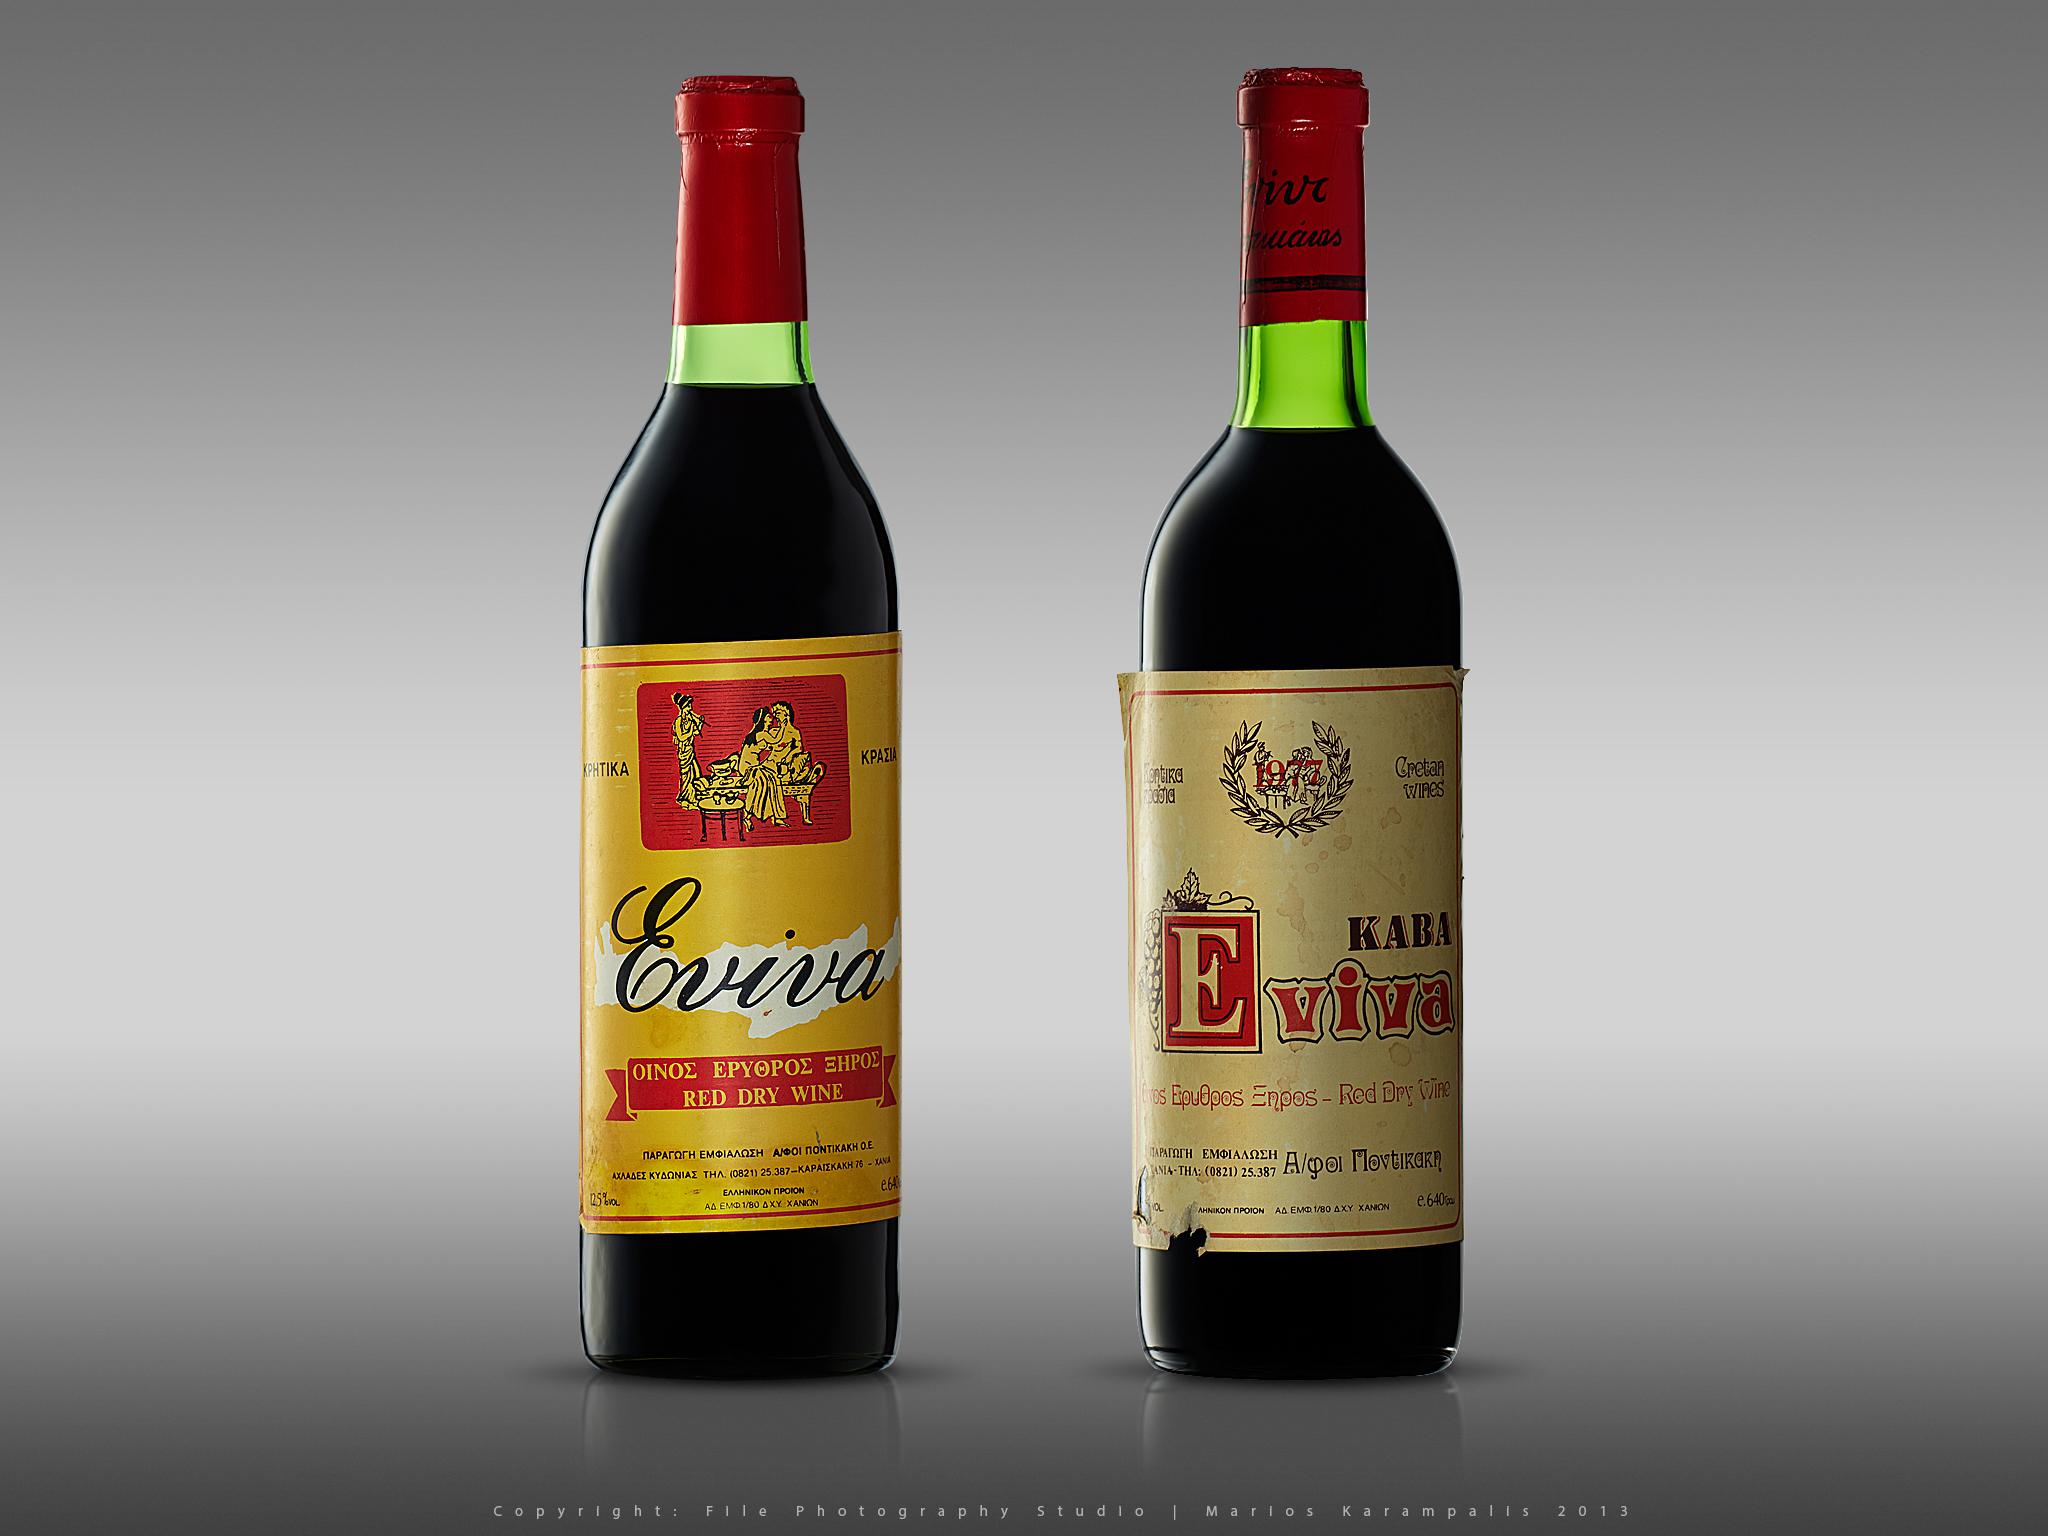 Aretousa-Wines Tradition